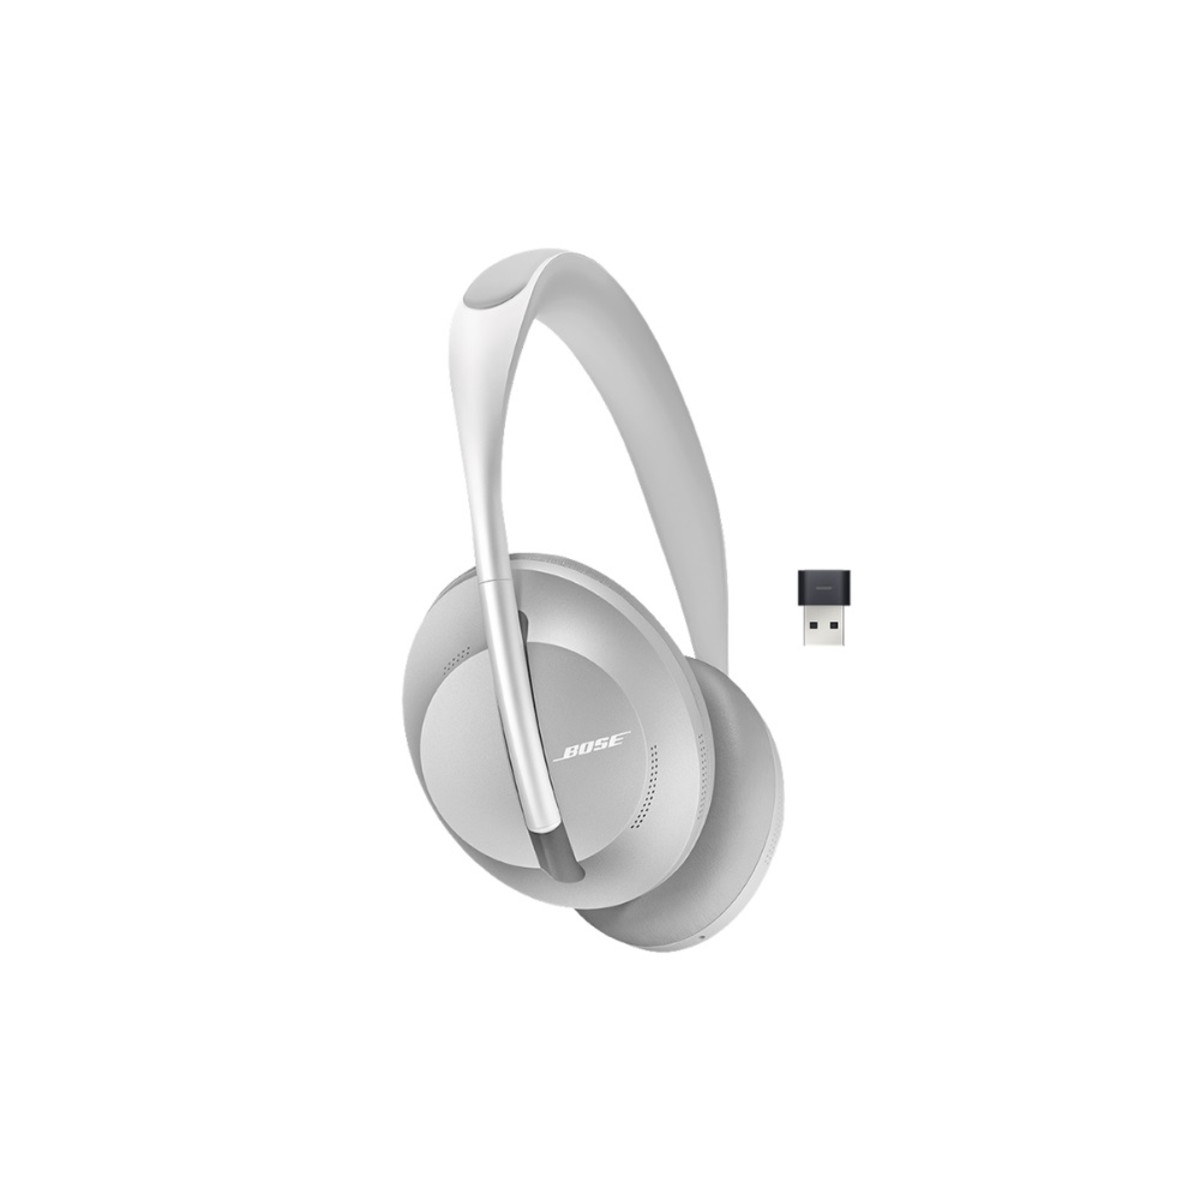 Bose 700 UC Bluetooth Headphone USB-A, Silver (no return)